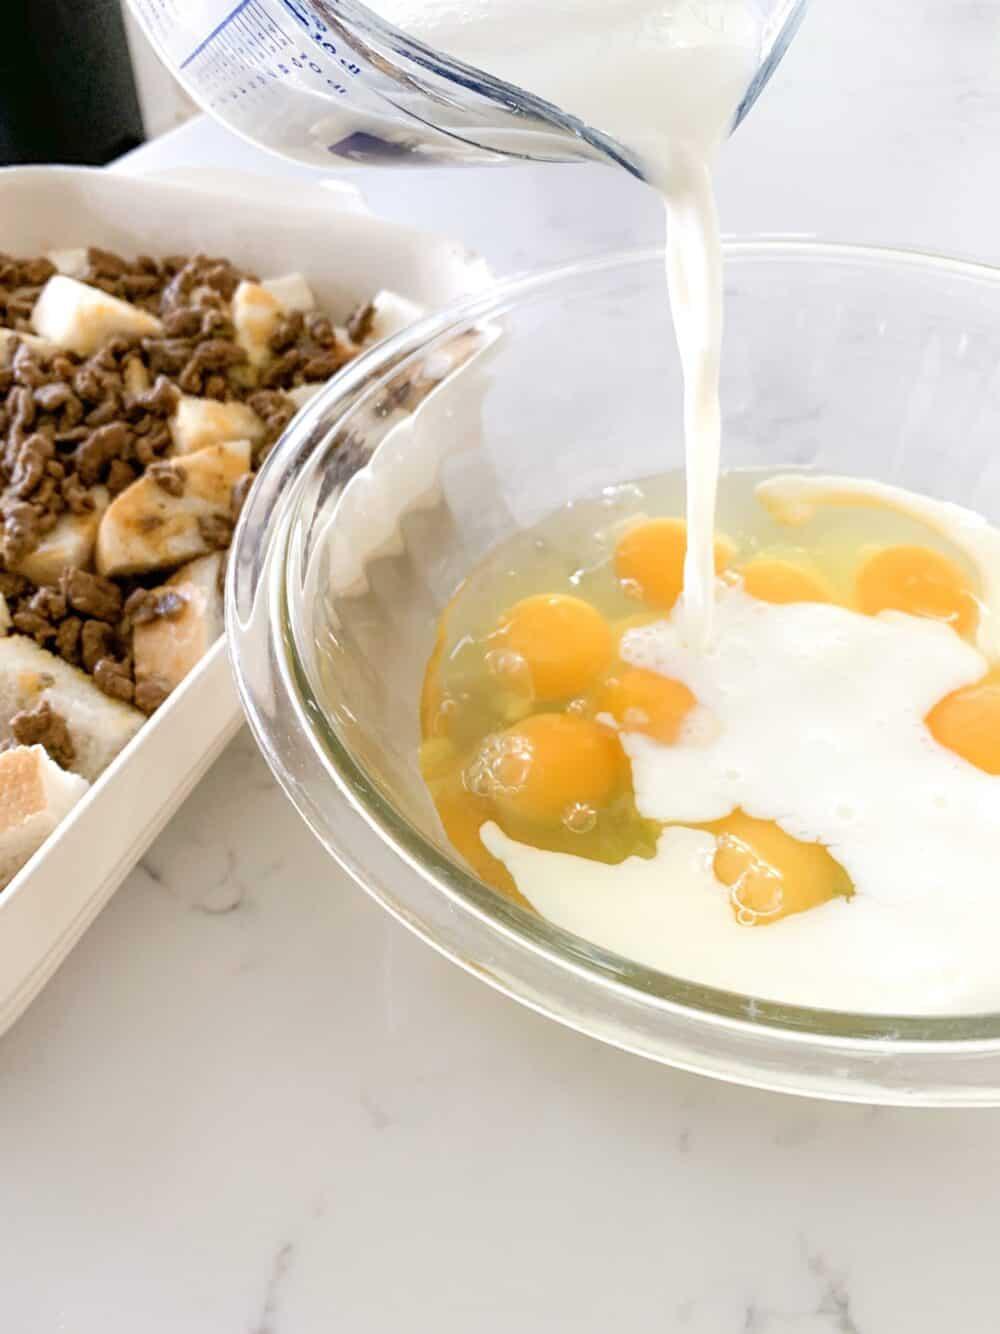 pouring milk into egg bowl